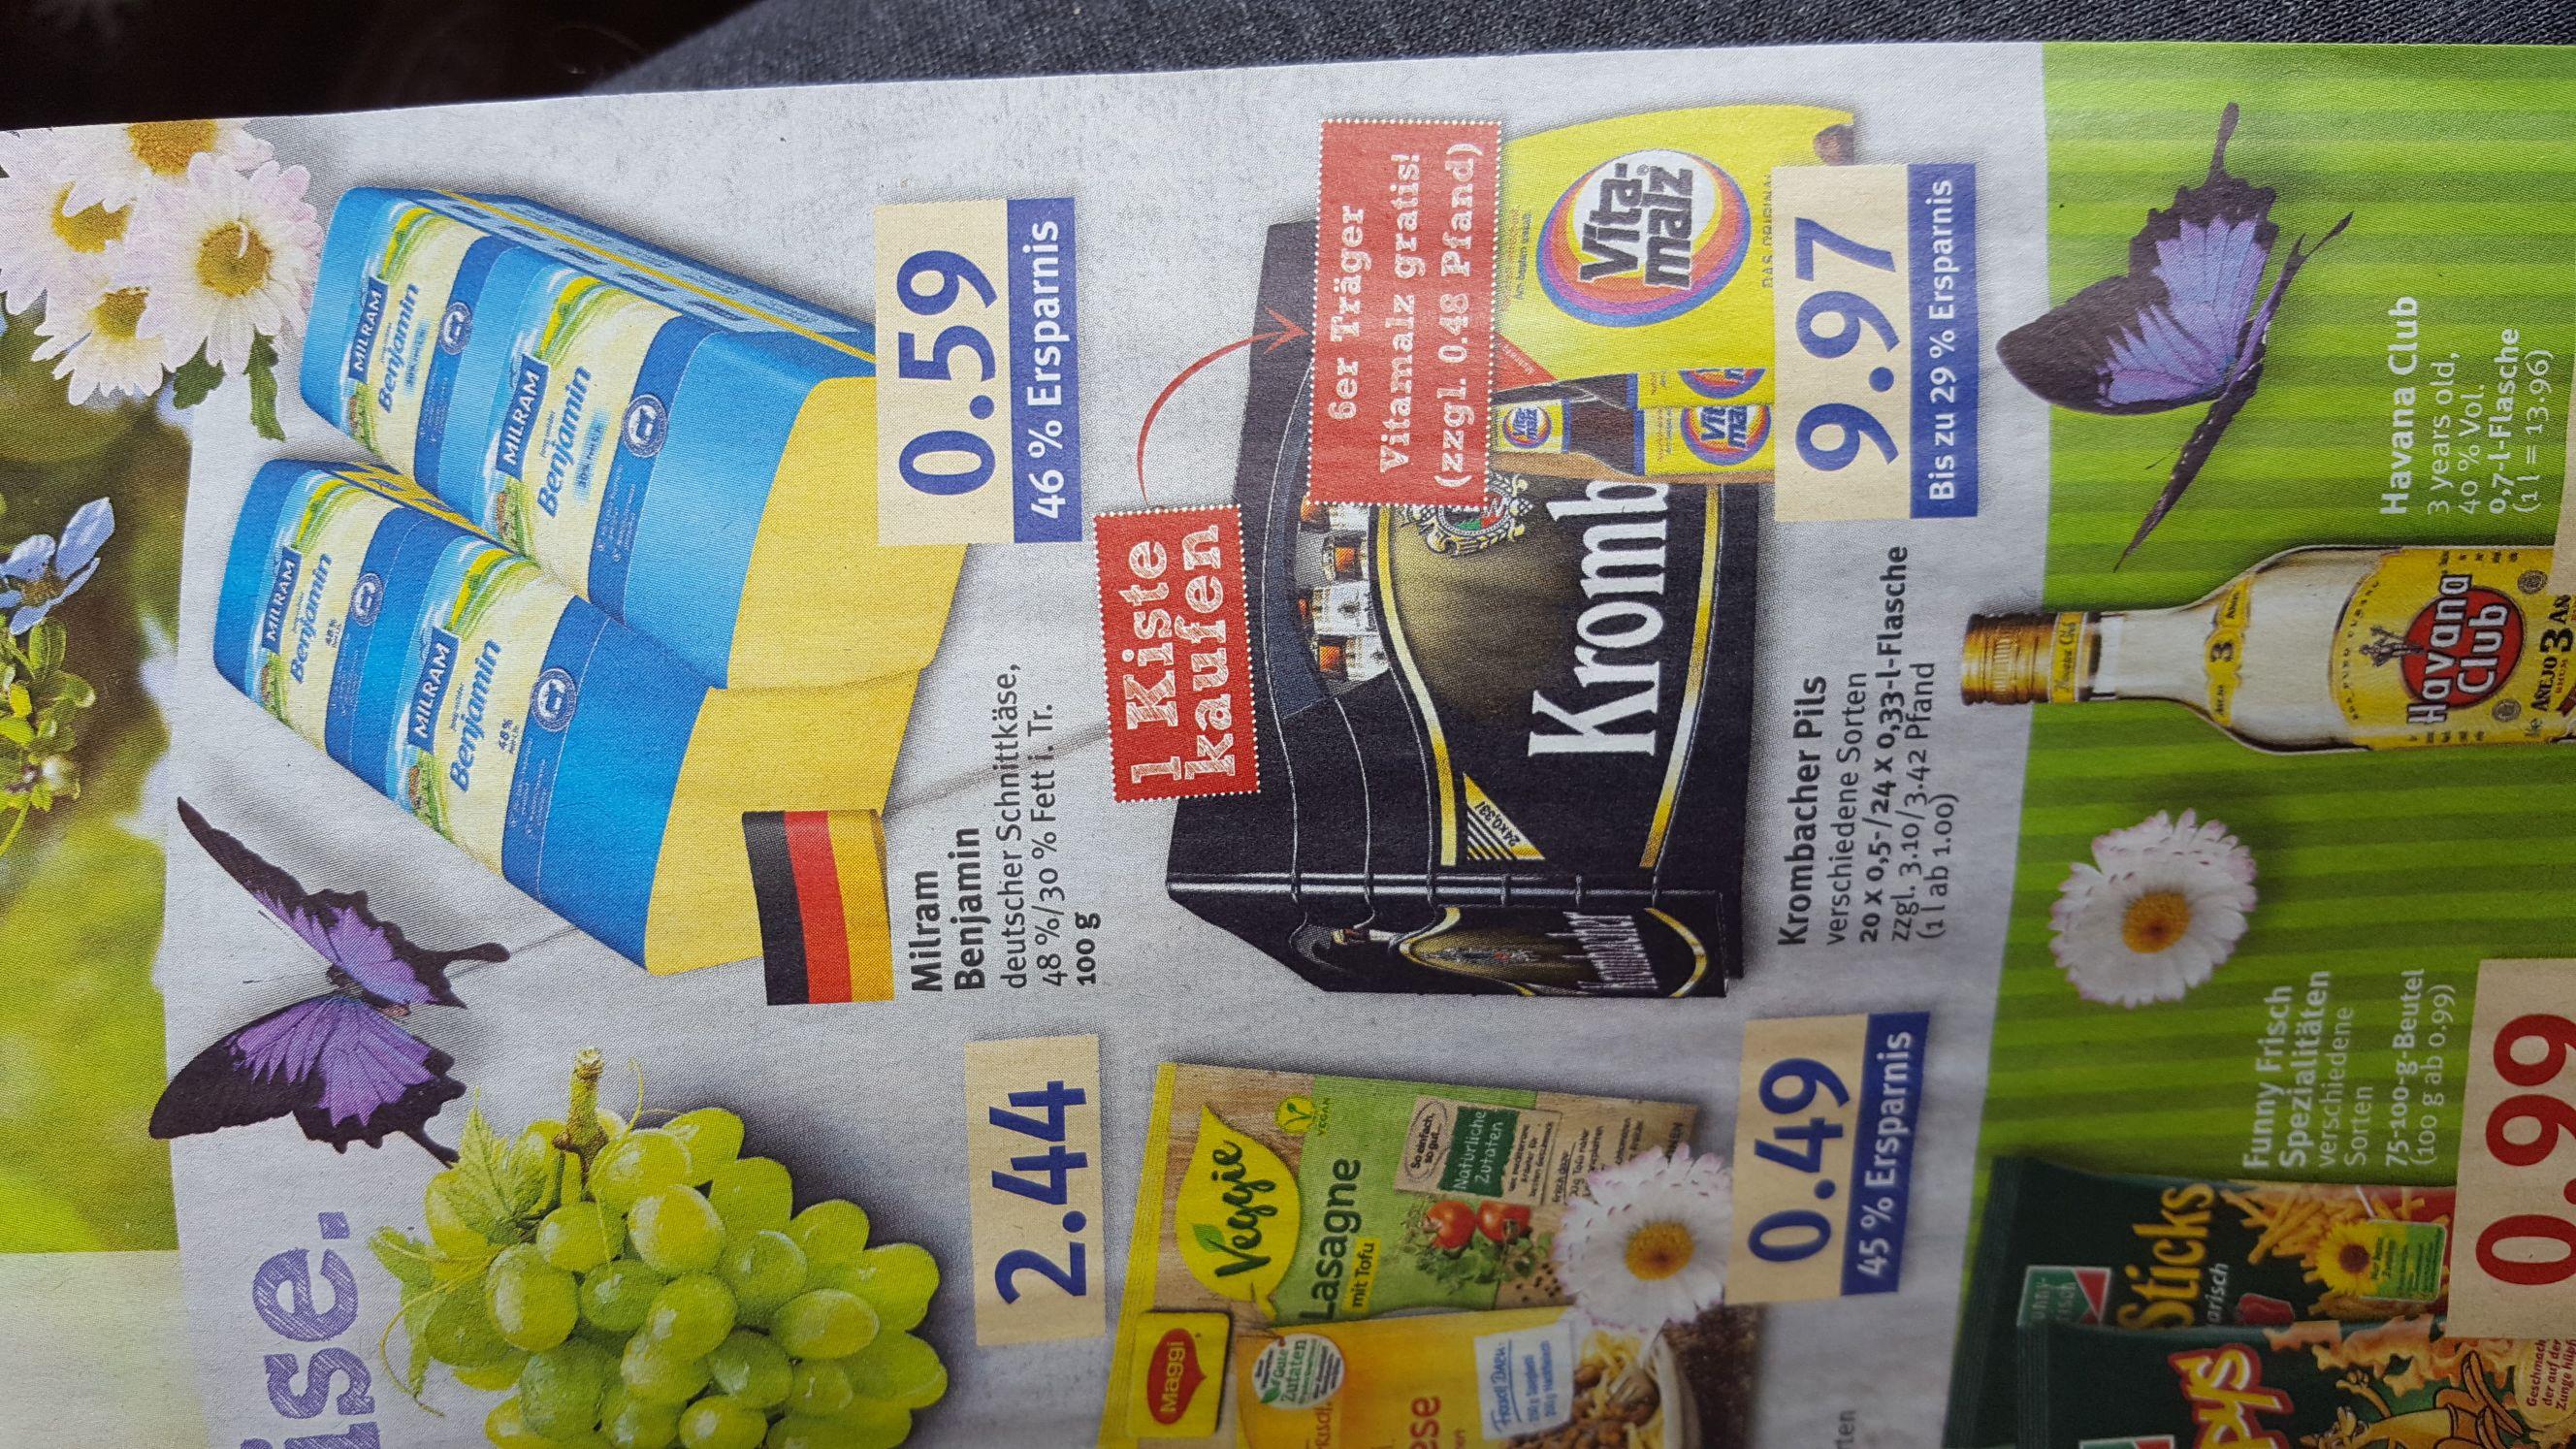 [Combi] Kiste Krombacher (24x0.33 oder 20x0.5) + 6x0.33 Vitamalz